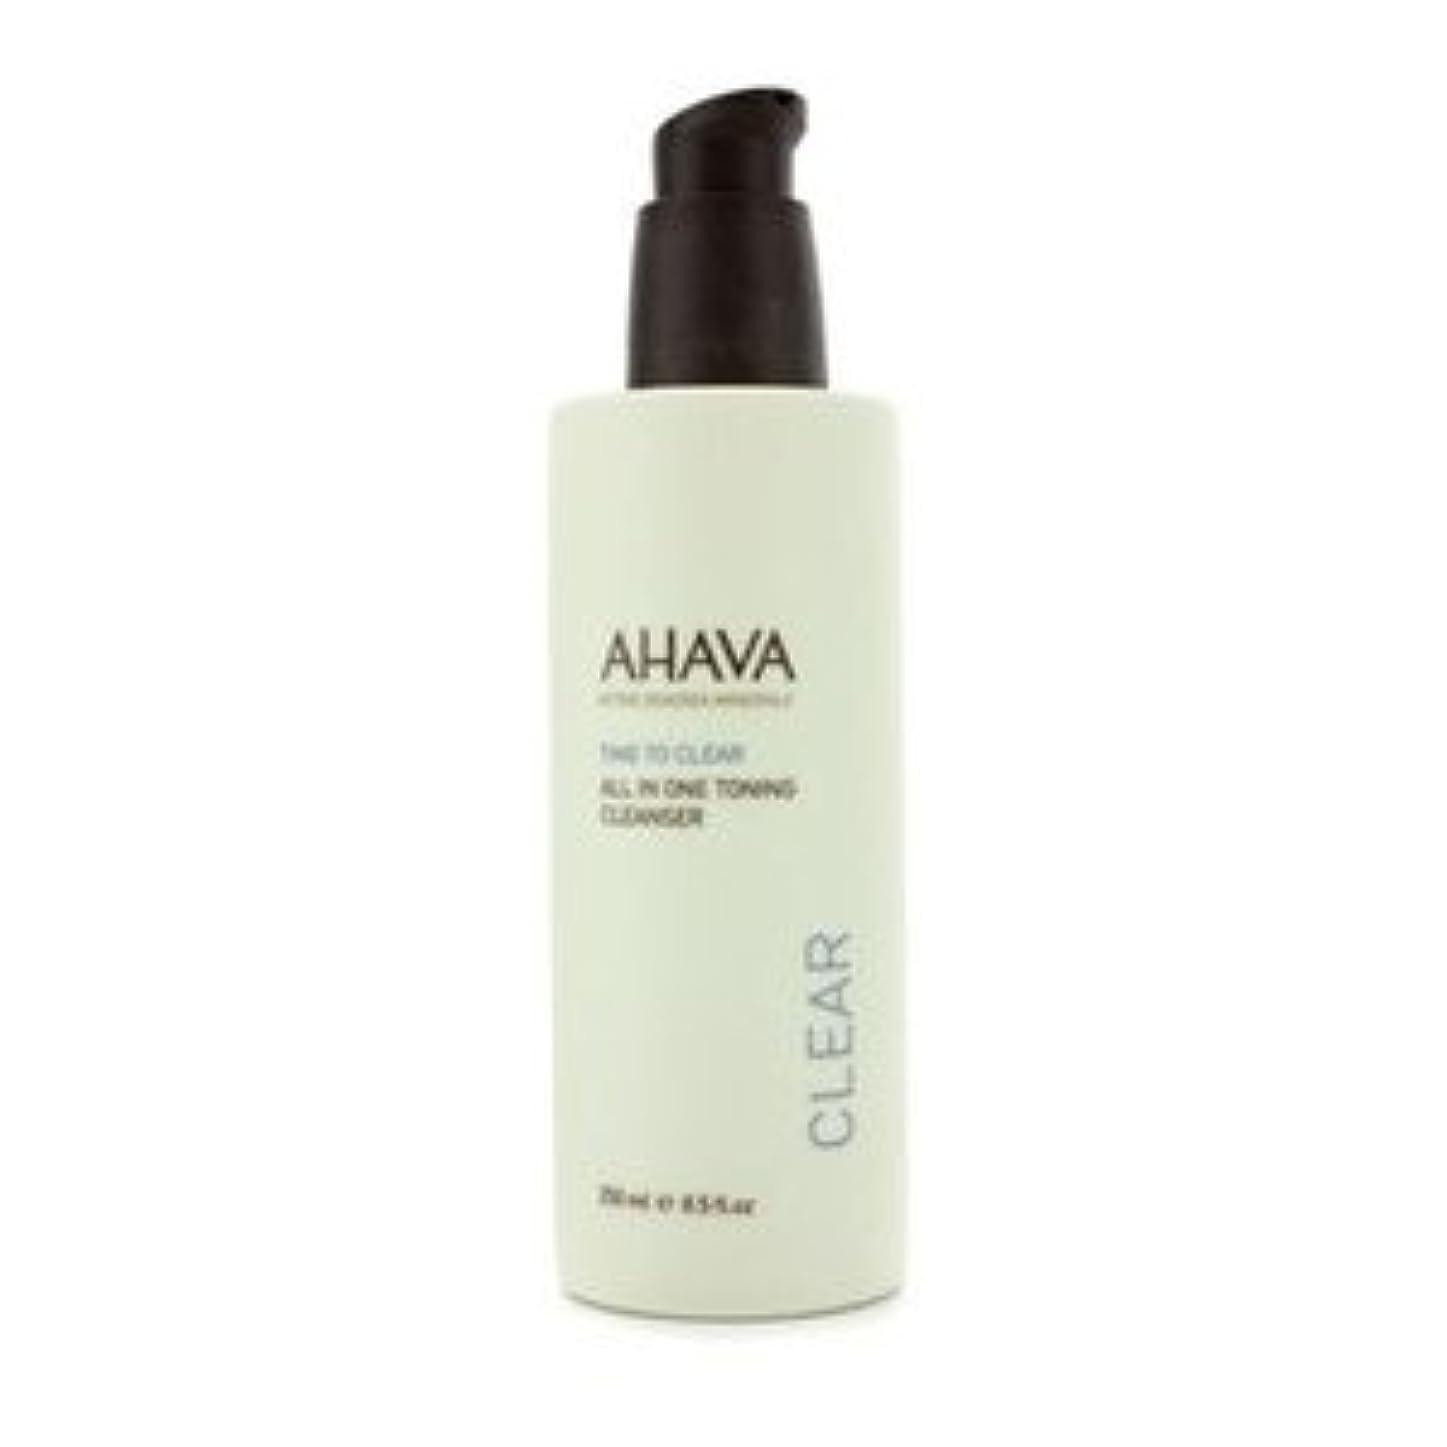 AHAVA(アハバ) タイム トゥ クリア オール イン ワン トニング クレンザー 250ml/8.5oz [並行輸入品]